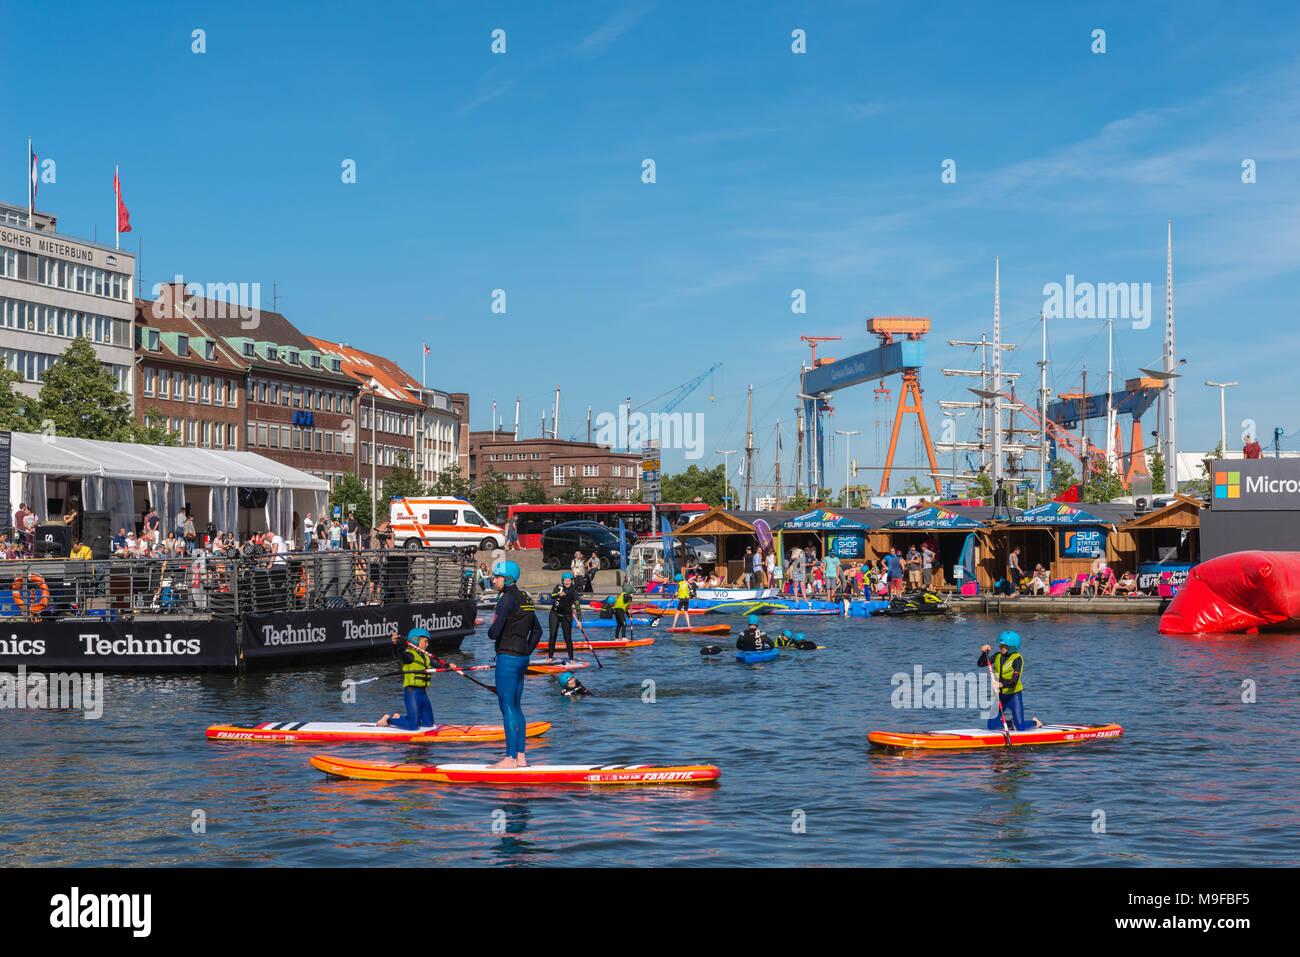 Bootshafen Kieler Woche Stock Photo